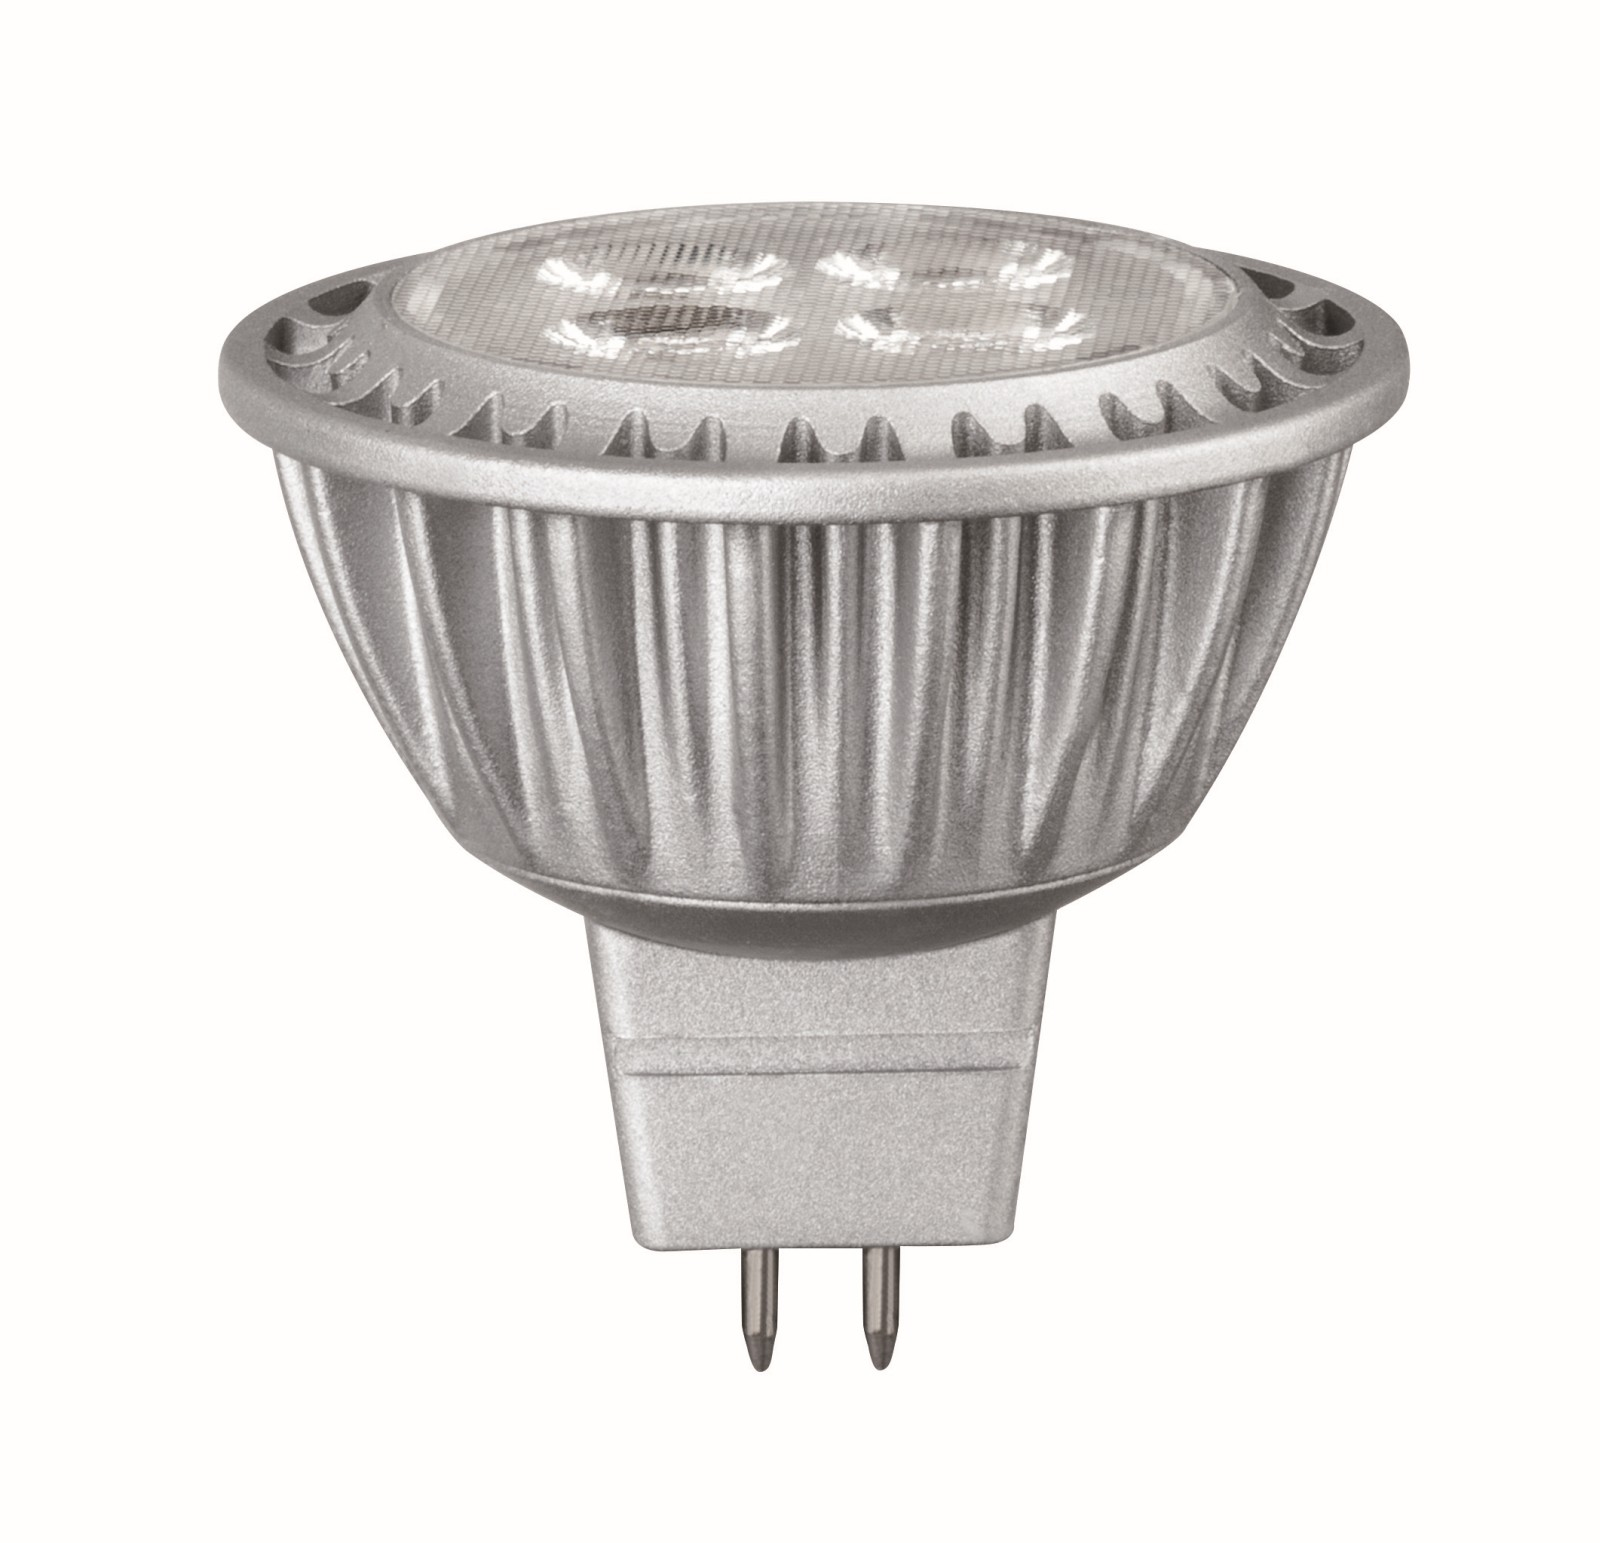 dimmbare led leuchtmittel hier g nstig kaufen markenbaumarkt24. Black Bedroom Furniture Sets. Home Design Ideas